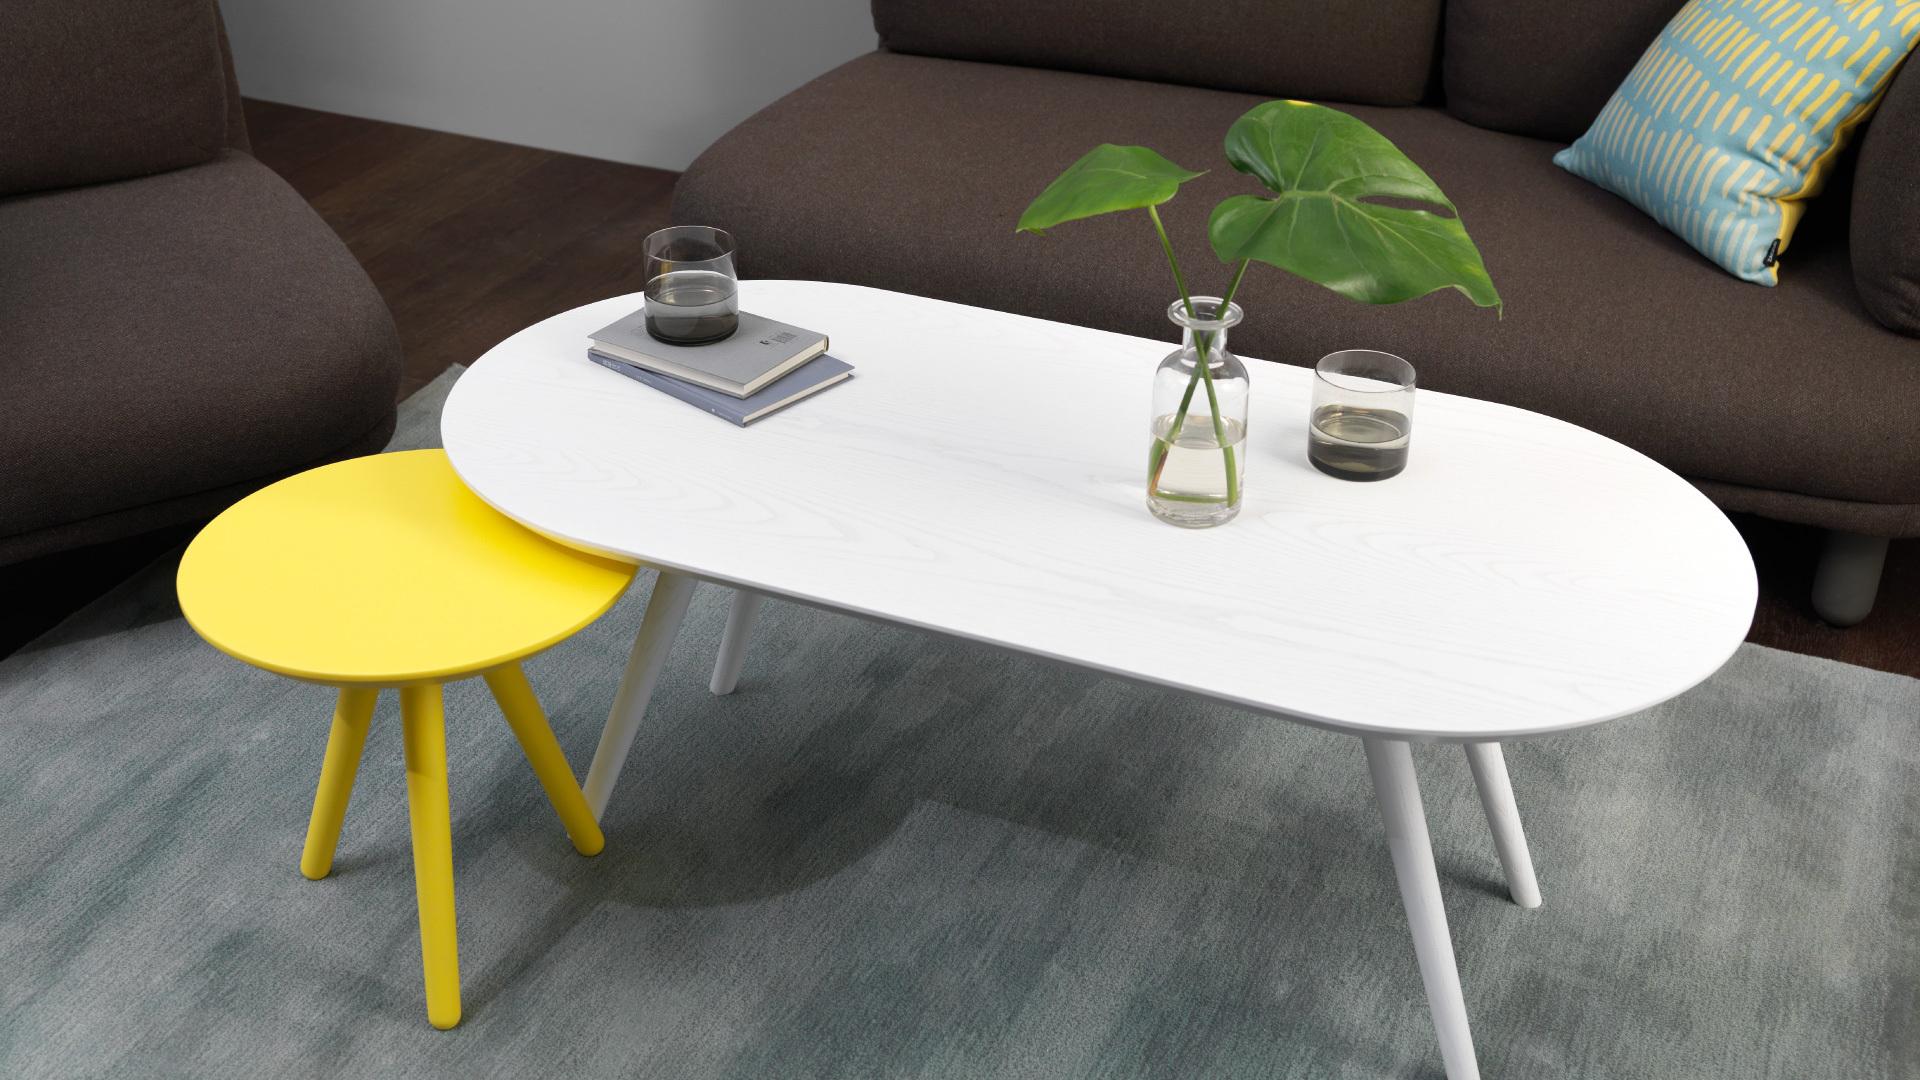 画板咖啡几-胶囊形 | Z-background Coffee Table